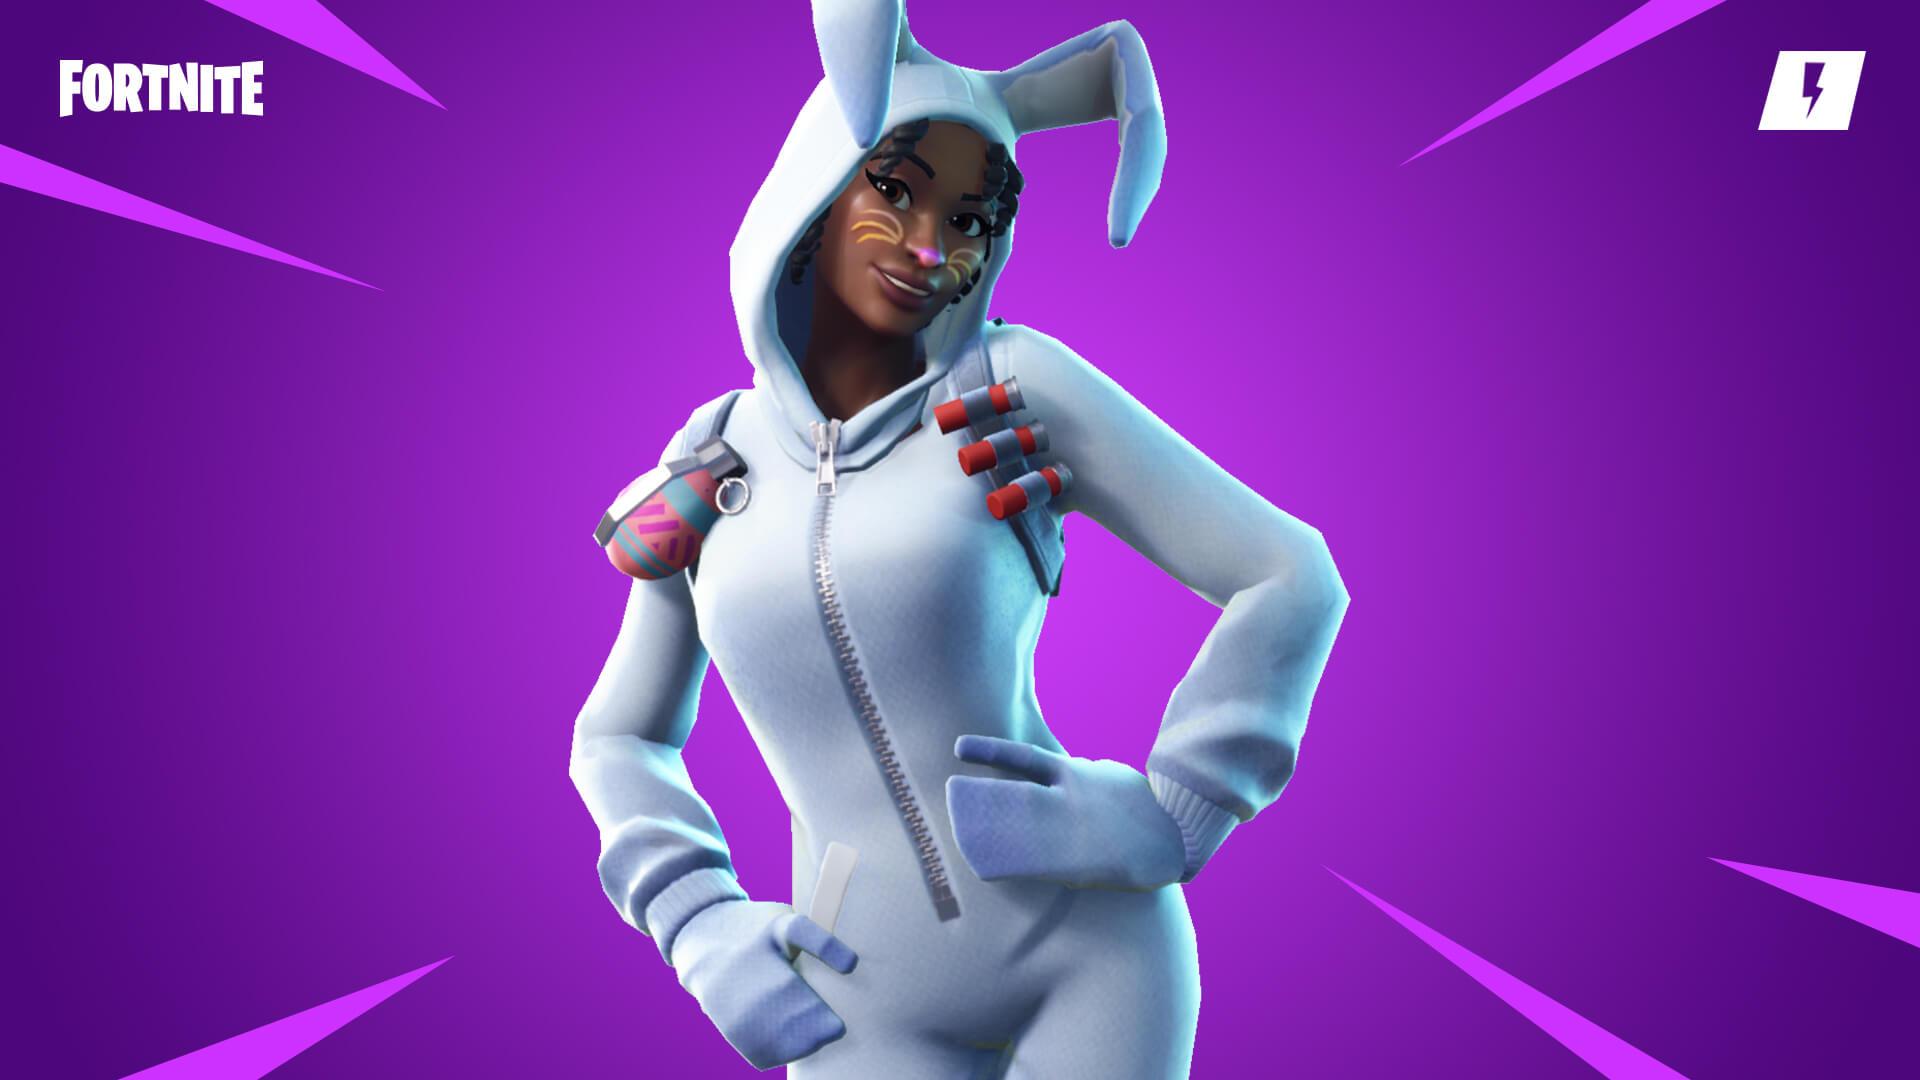 fortnite-Bunny-brawler-luna.jpg